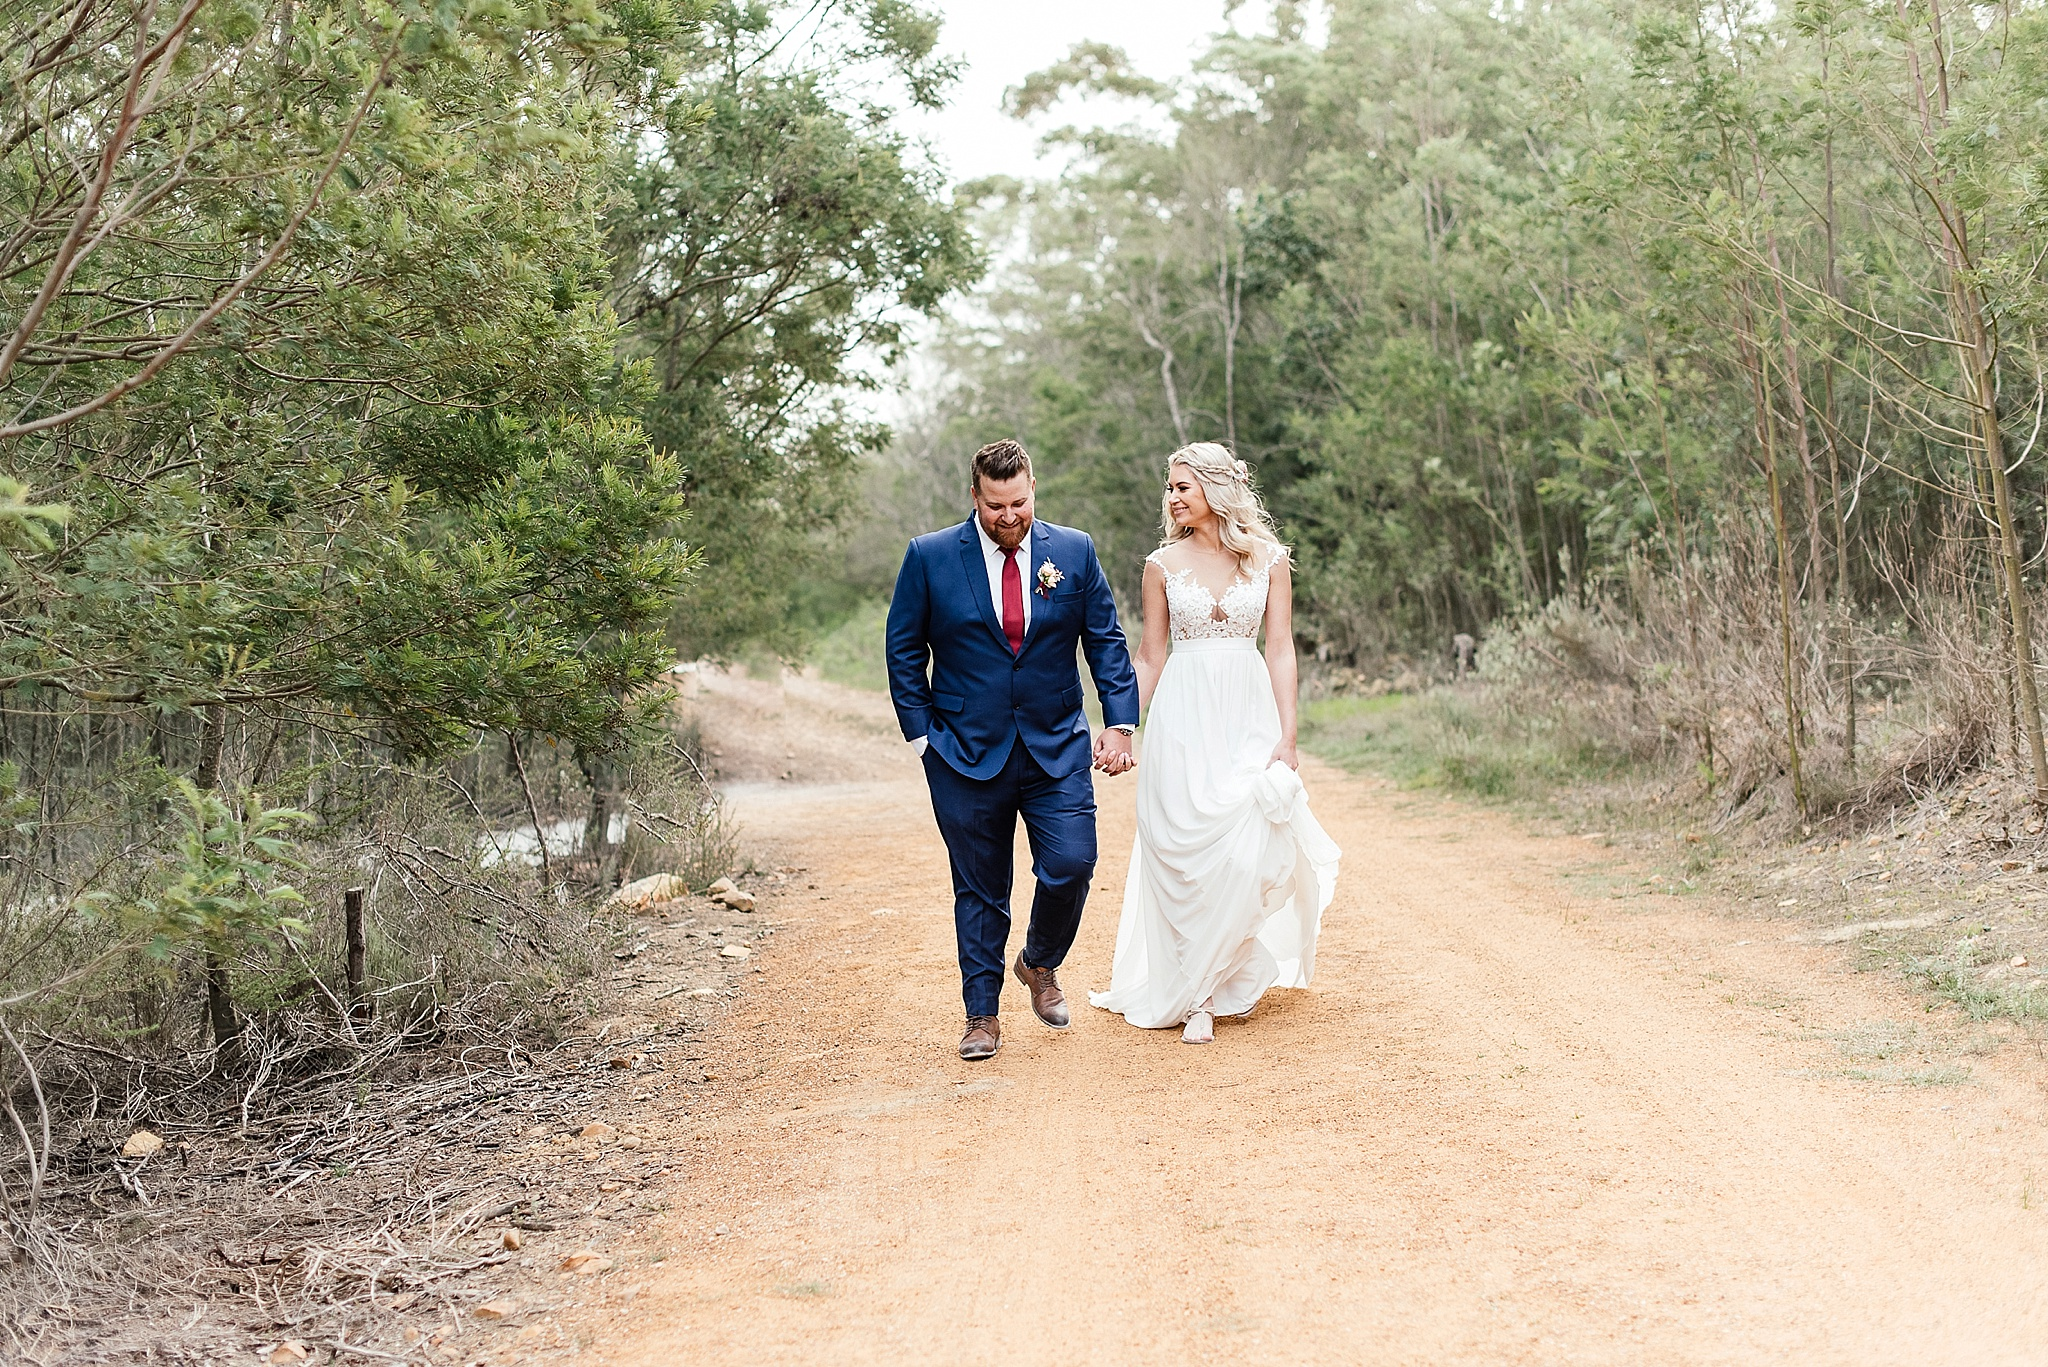 Cape Town Photographer Darren Bester - Die Woud Wedding - Gareth & Roxanne_0031.jpg